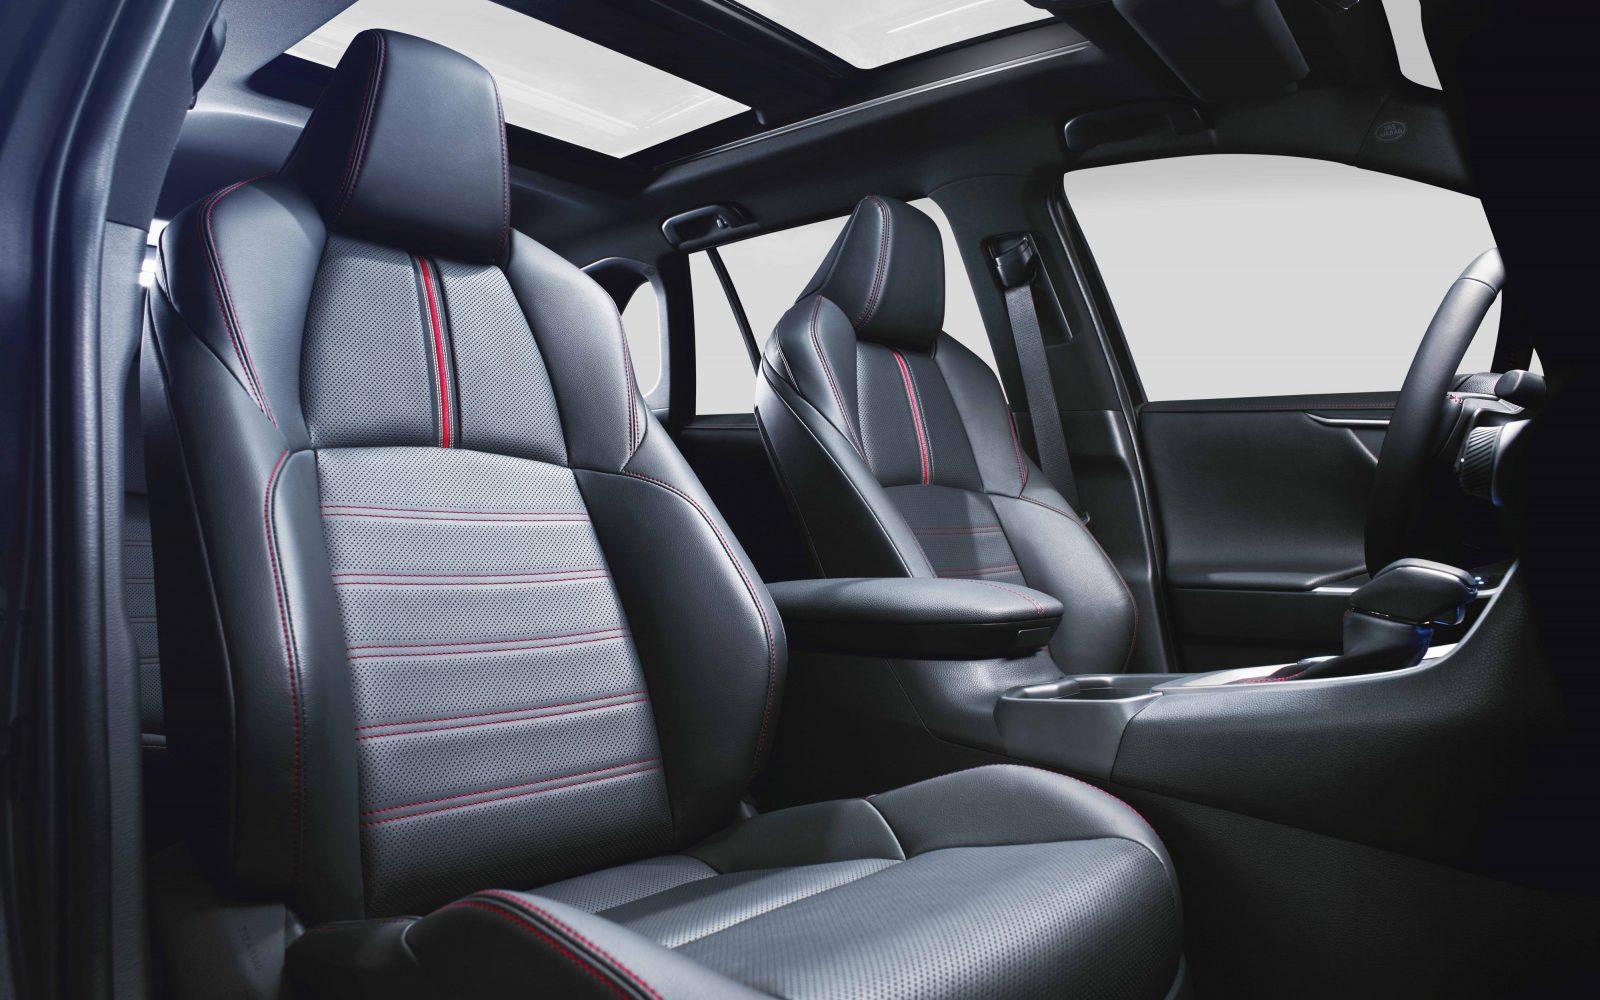 Toyota RAV4 Plug-in Hybrid interior - front seats